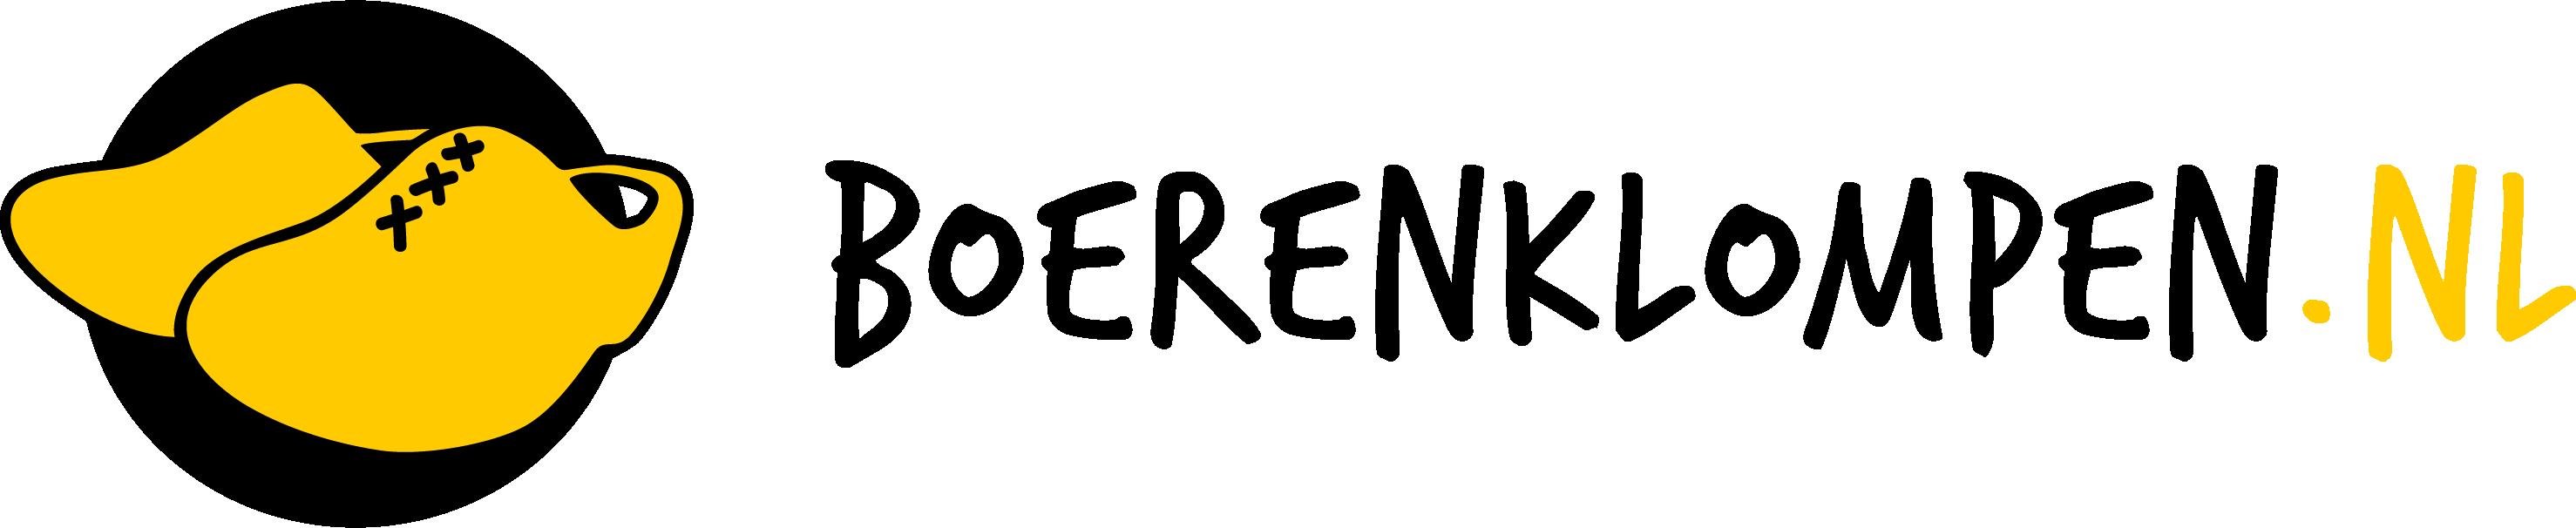 Logo Boerenklompen